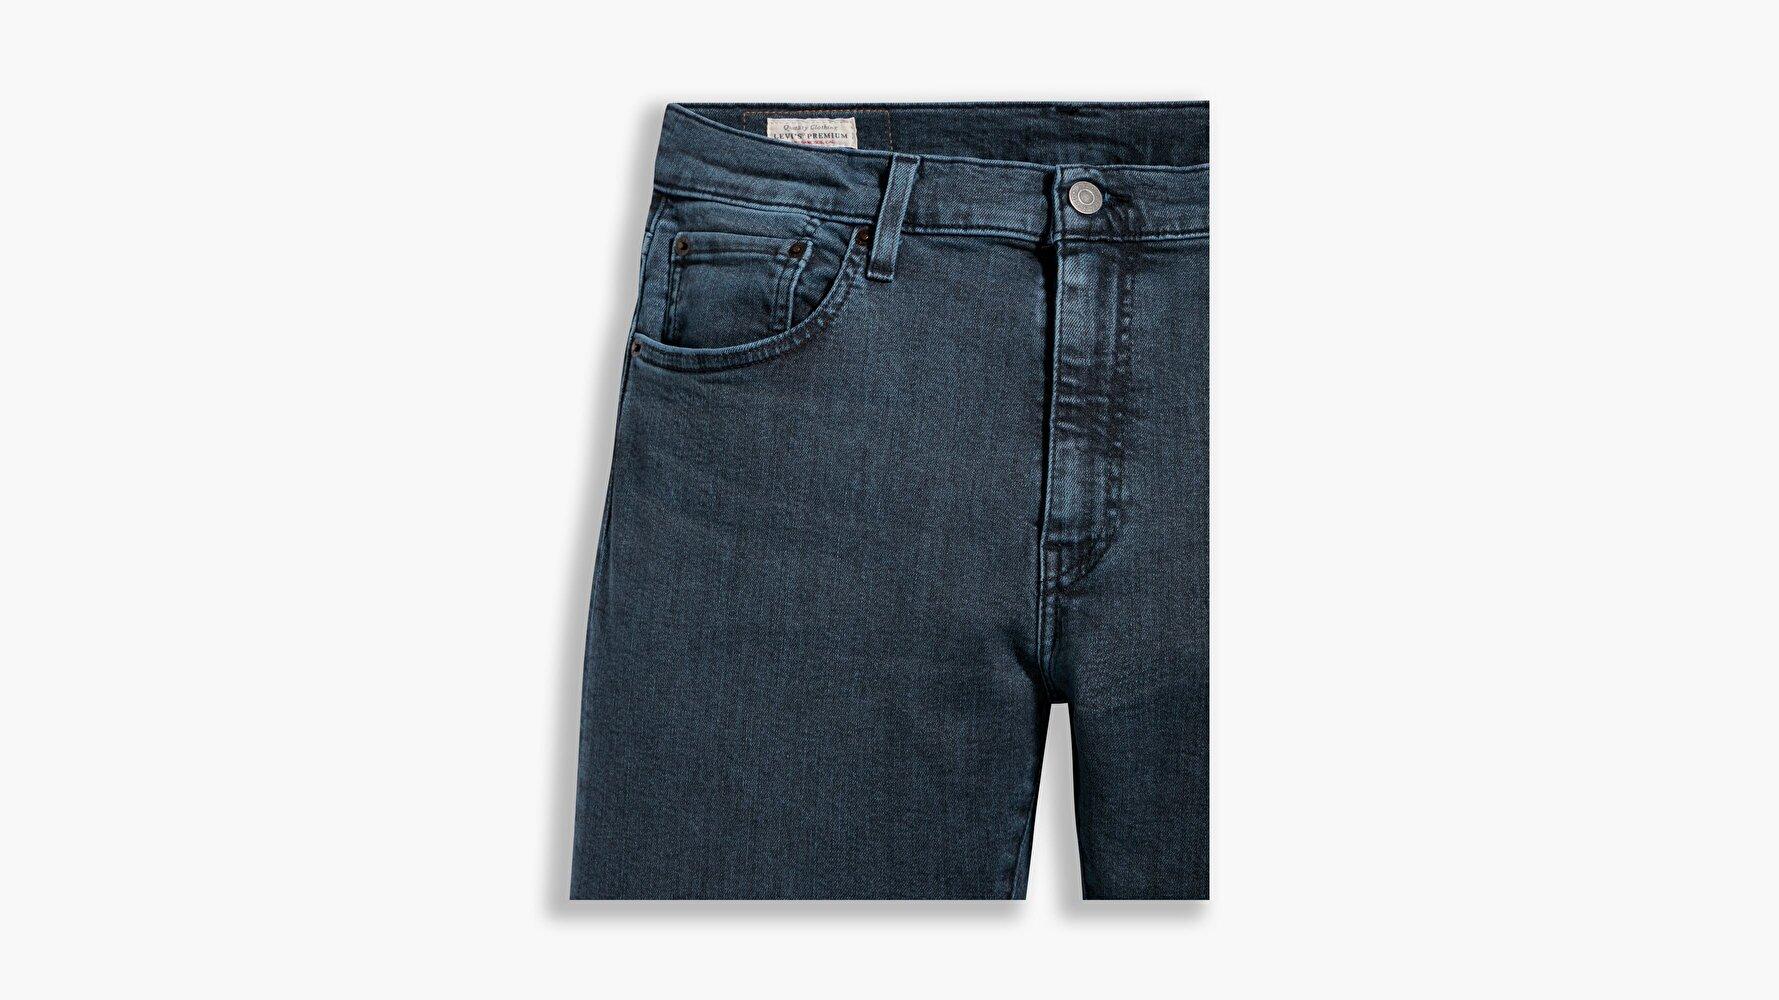 512™ Slim Taper Erkek Jean Pantolon-X9989 Lse_Richmond Blue Black Od Adv